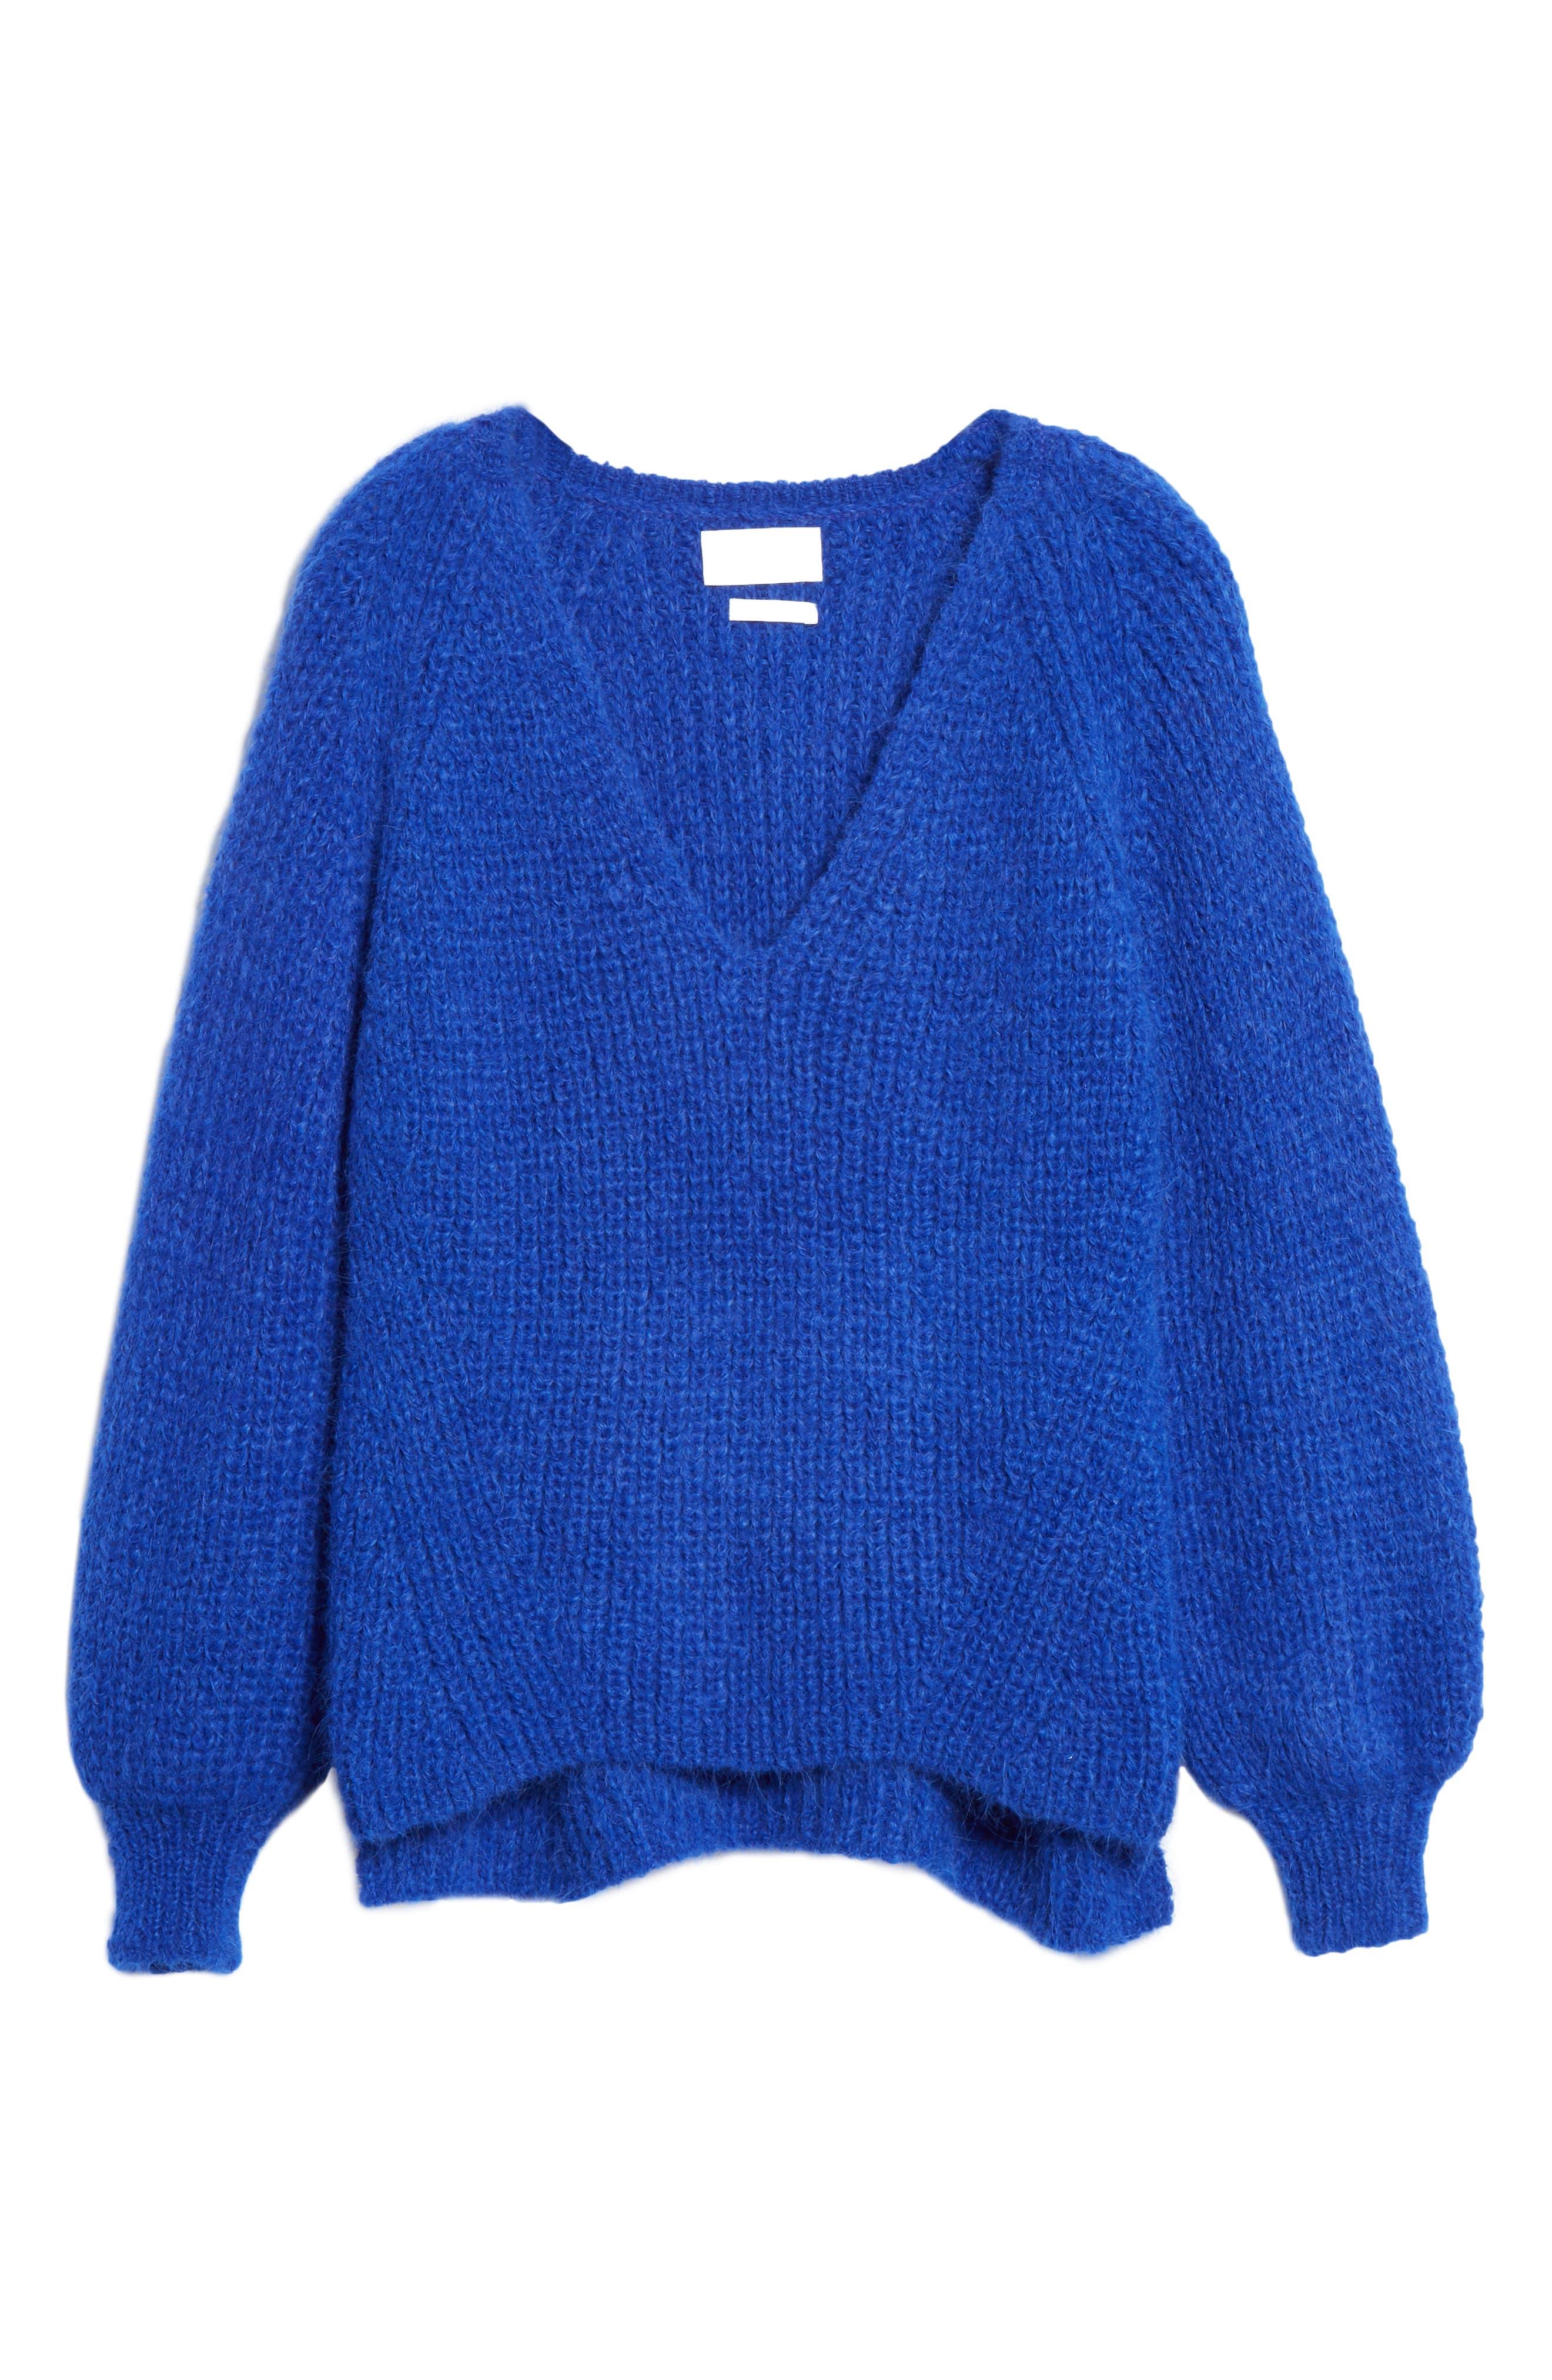 ELEVEN SIX,                             Tess Alpaca & Wool Blend Sweater,                             Alternate thumbnail 6, color,                             COLBOLT BLUE